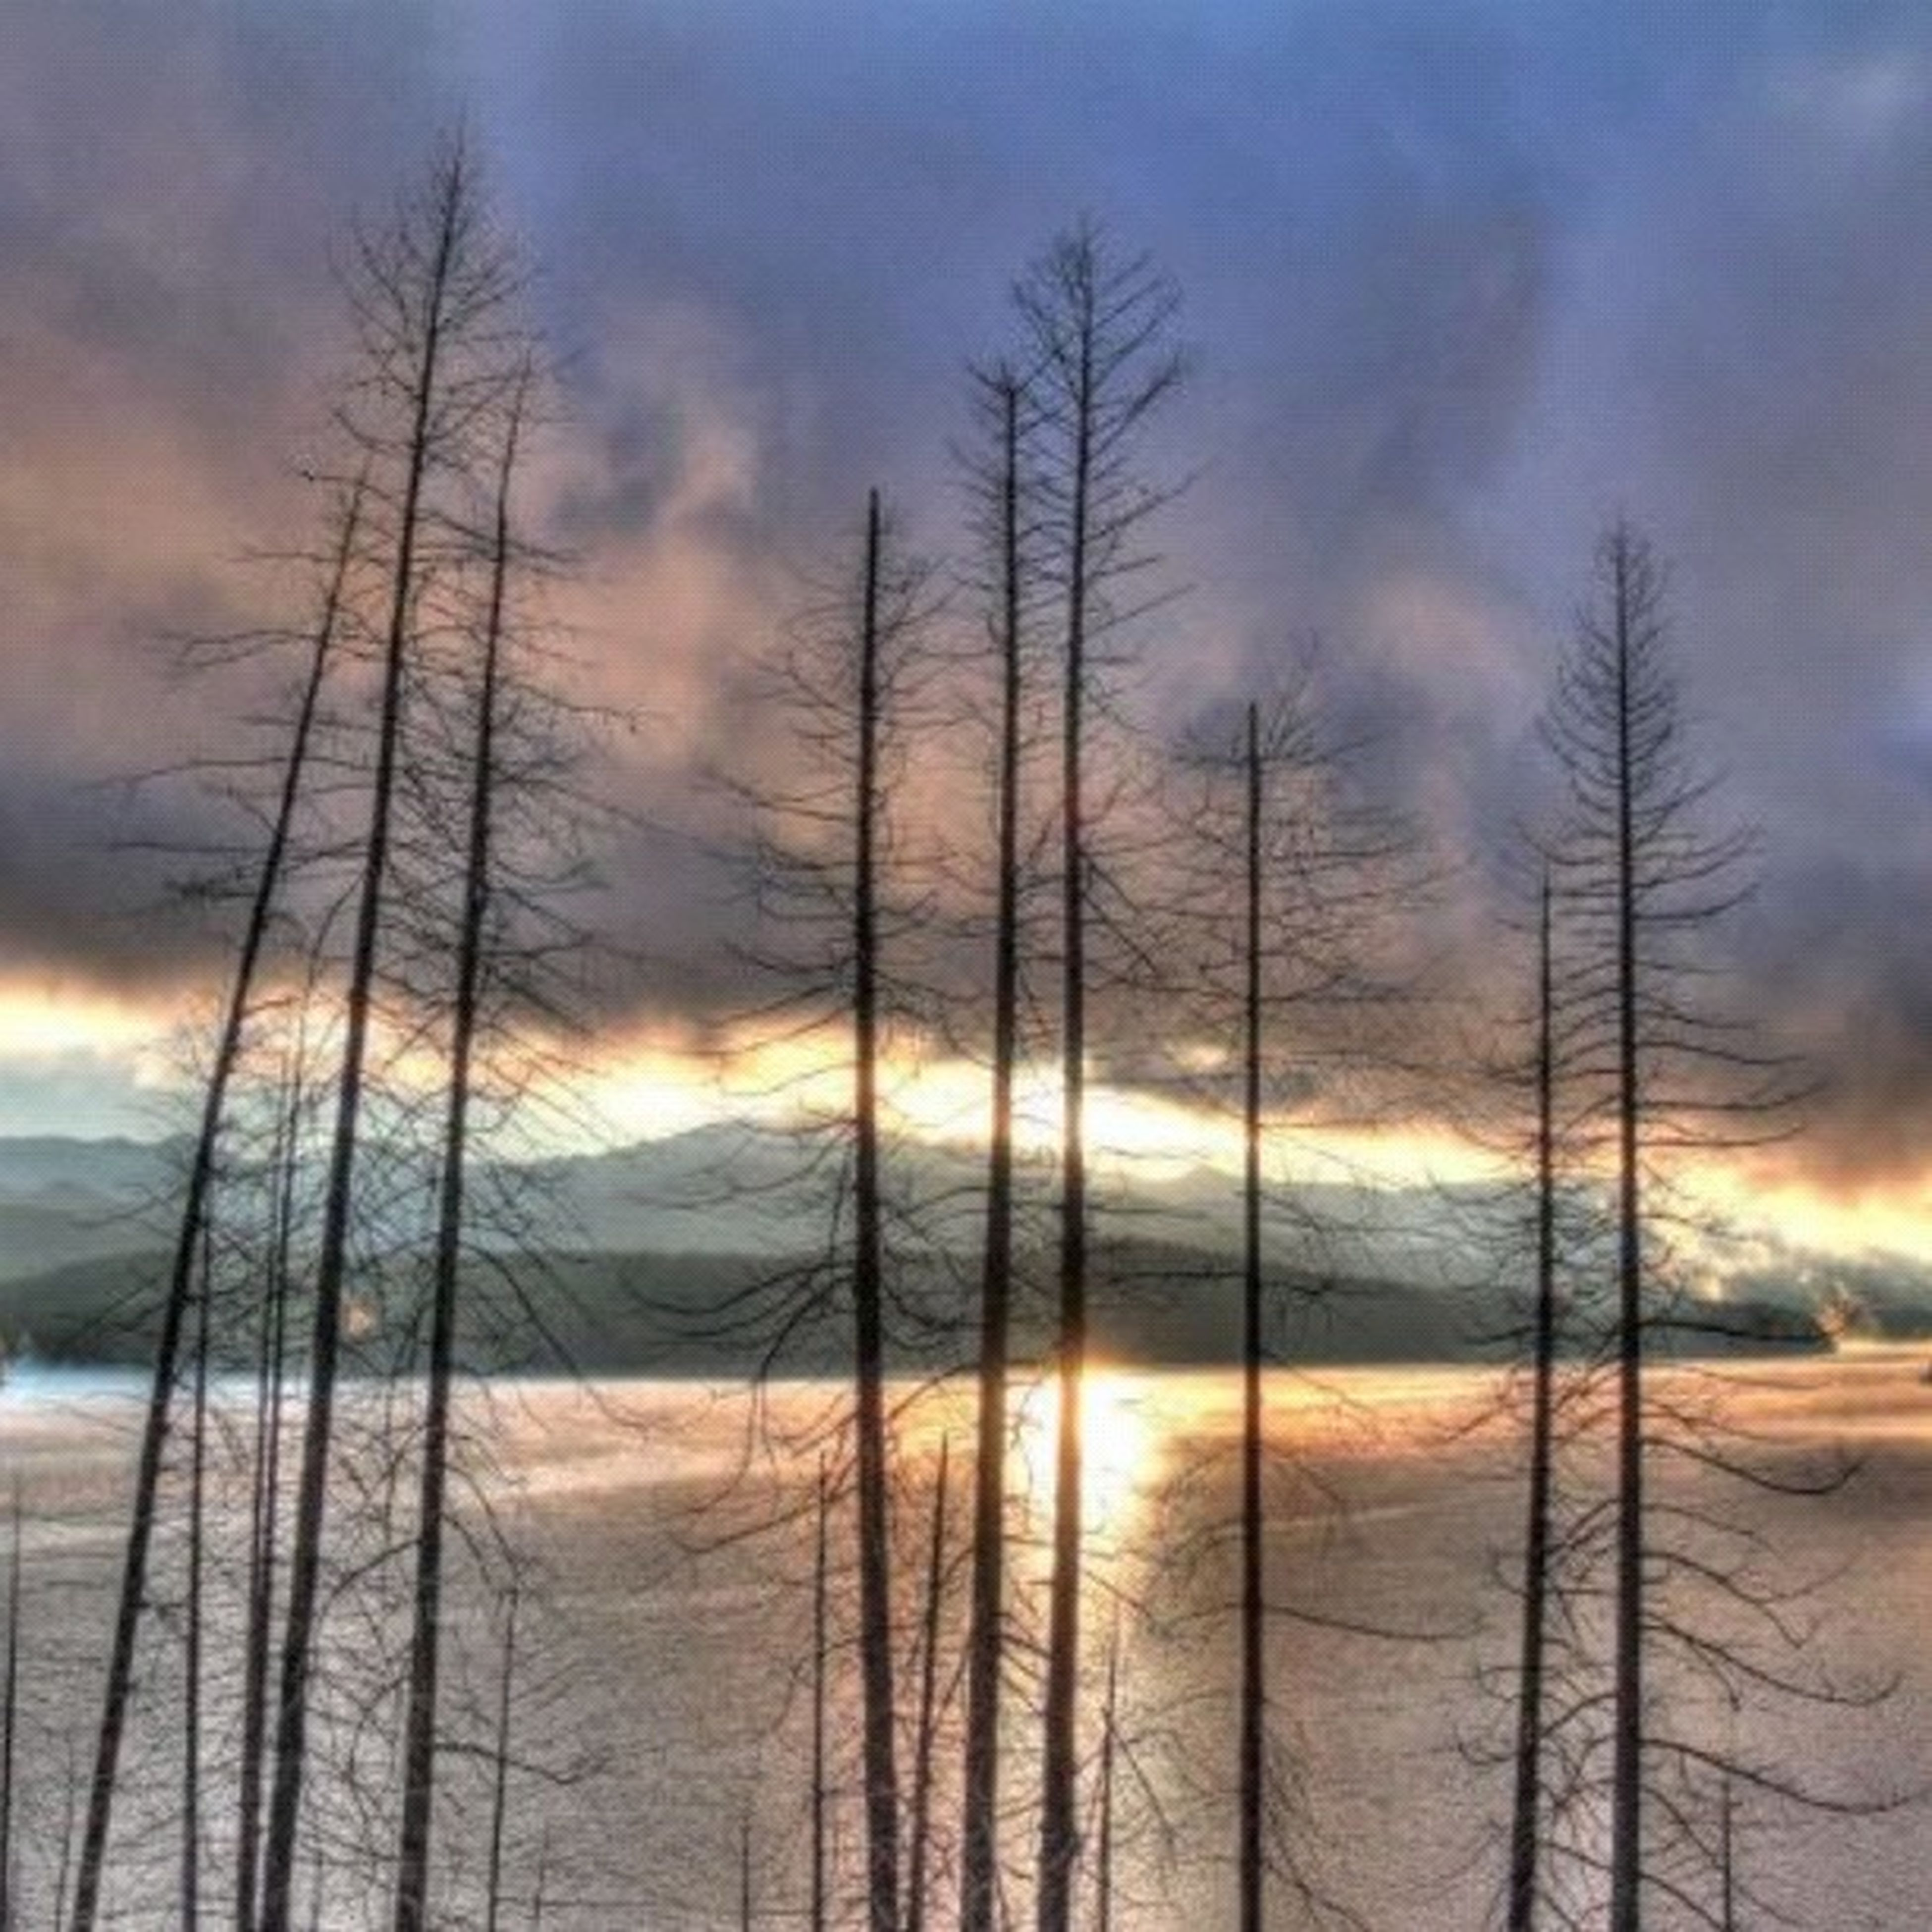 #HDR #GLACIERPARK #sunrise #montana #jewelbasin HDR Montana Instamood Instagramhub 30likes Instaebtree Jons30likes Jewelbasin Glacierpark Sunrise